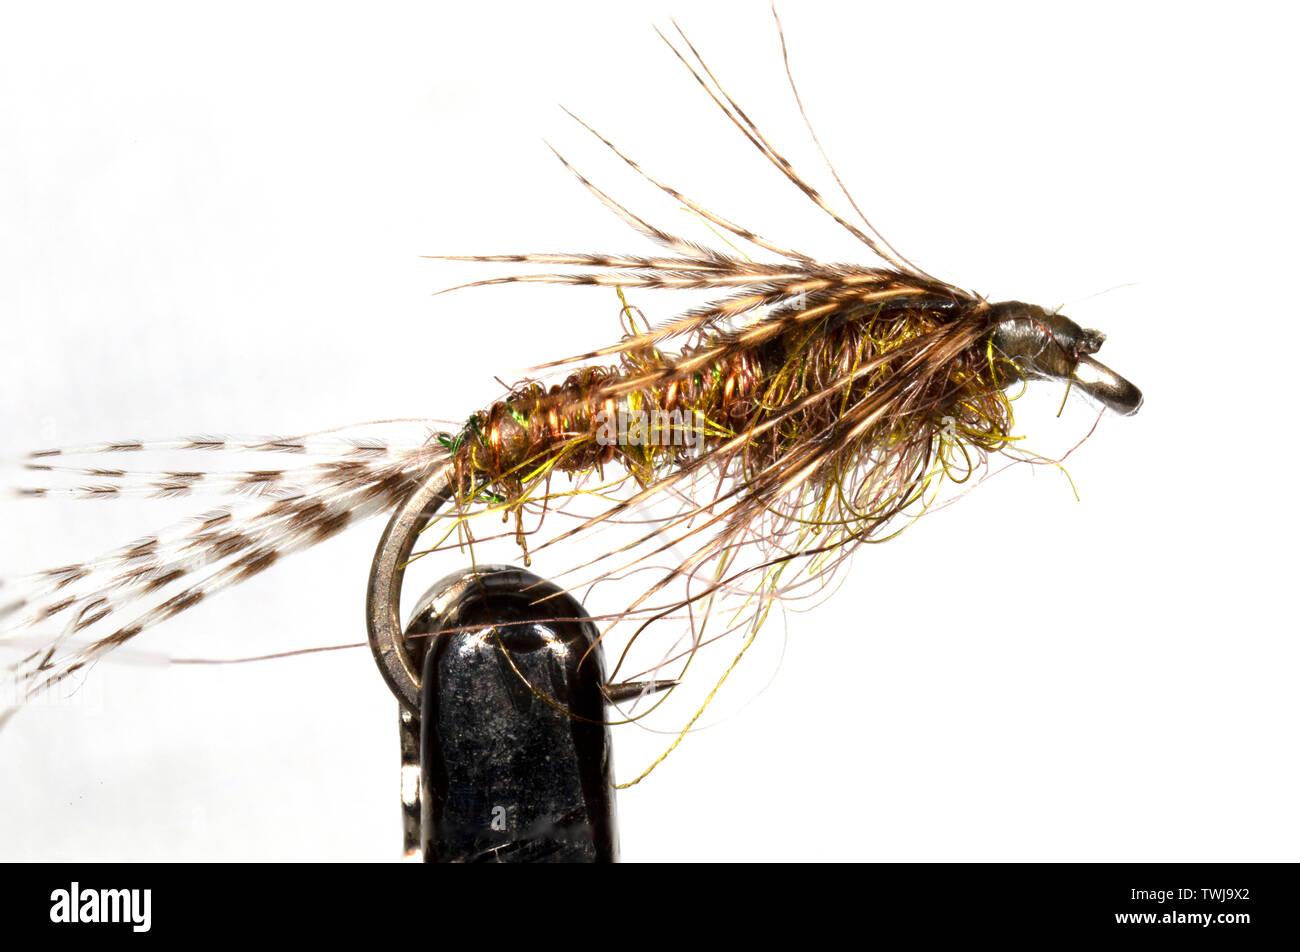 6 hare/'s ear nymphe lièvre nymphe truite mouches ombres mouches de pêche mouches